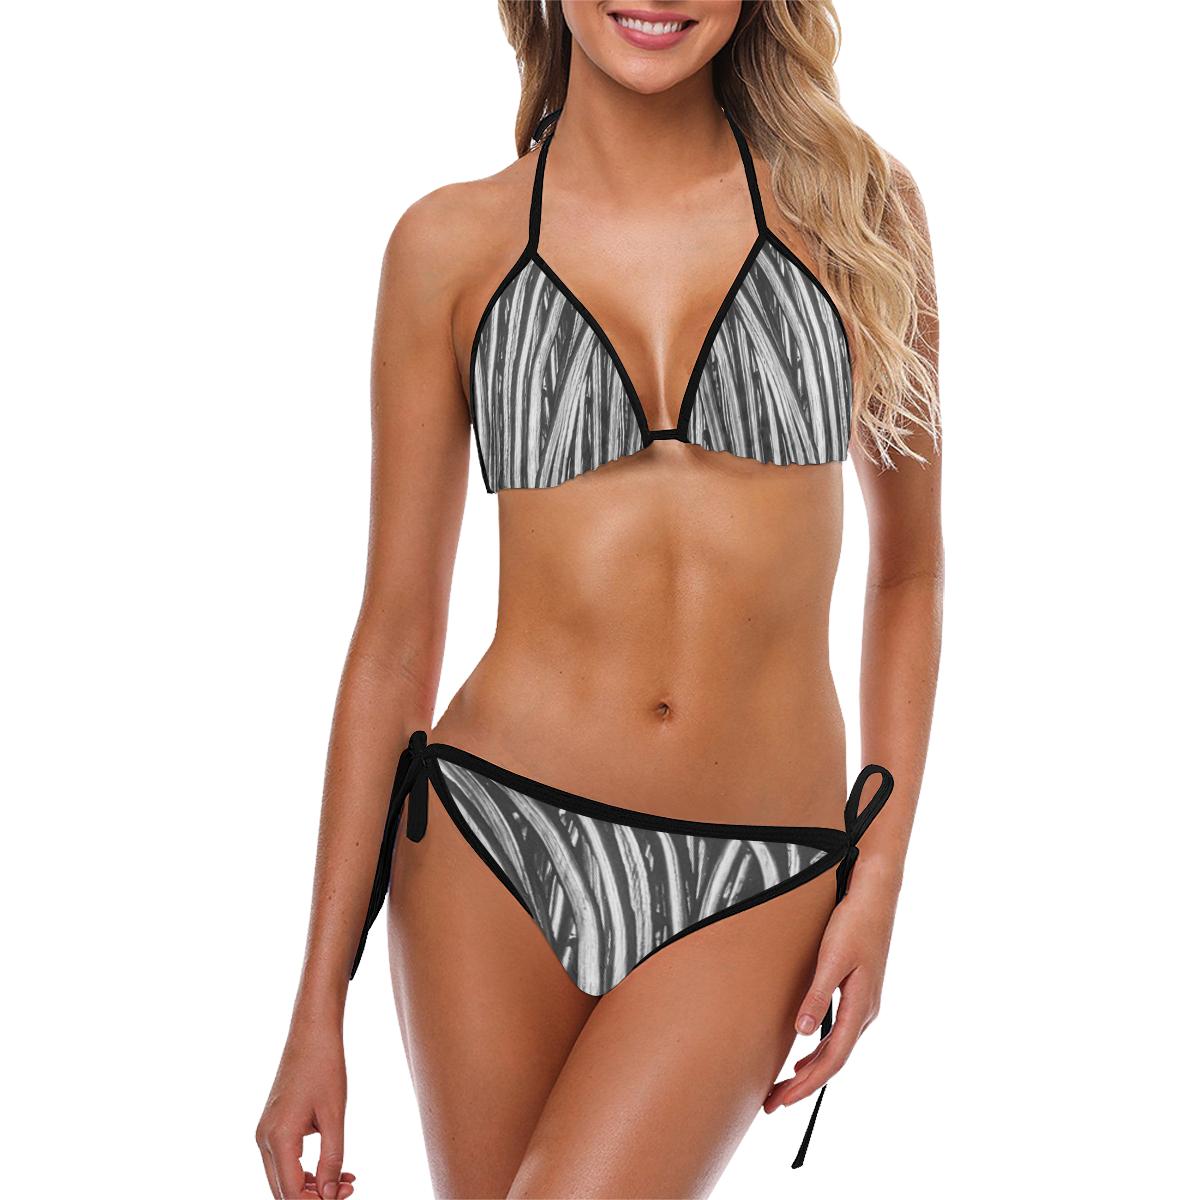 rope trans Custom Bikini Swimsuit (Model S01)